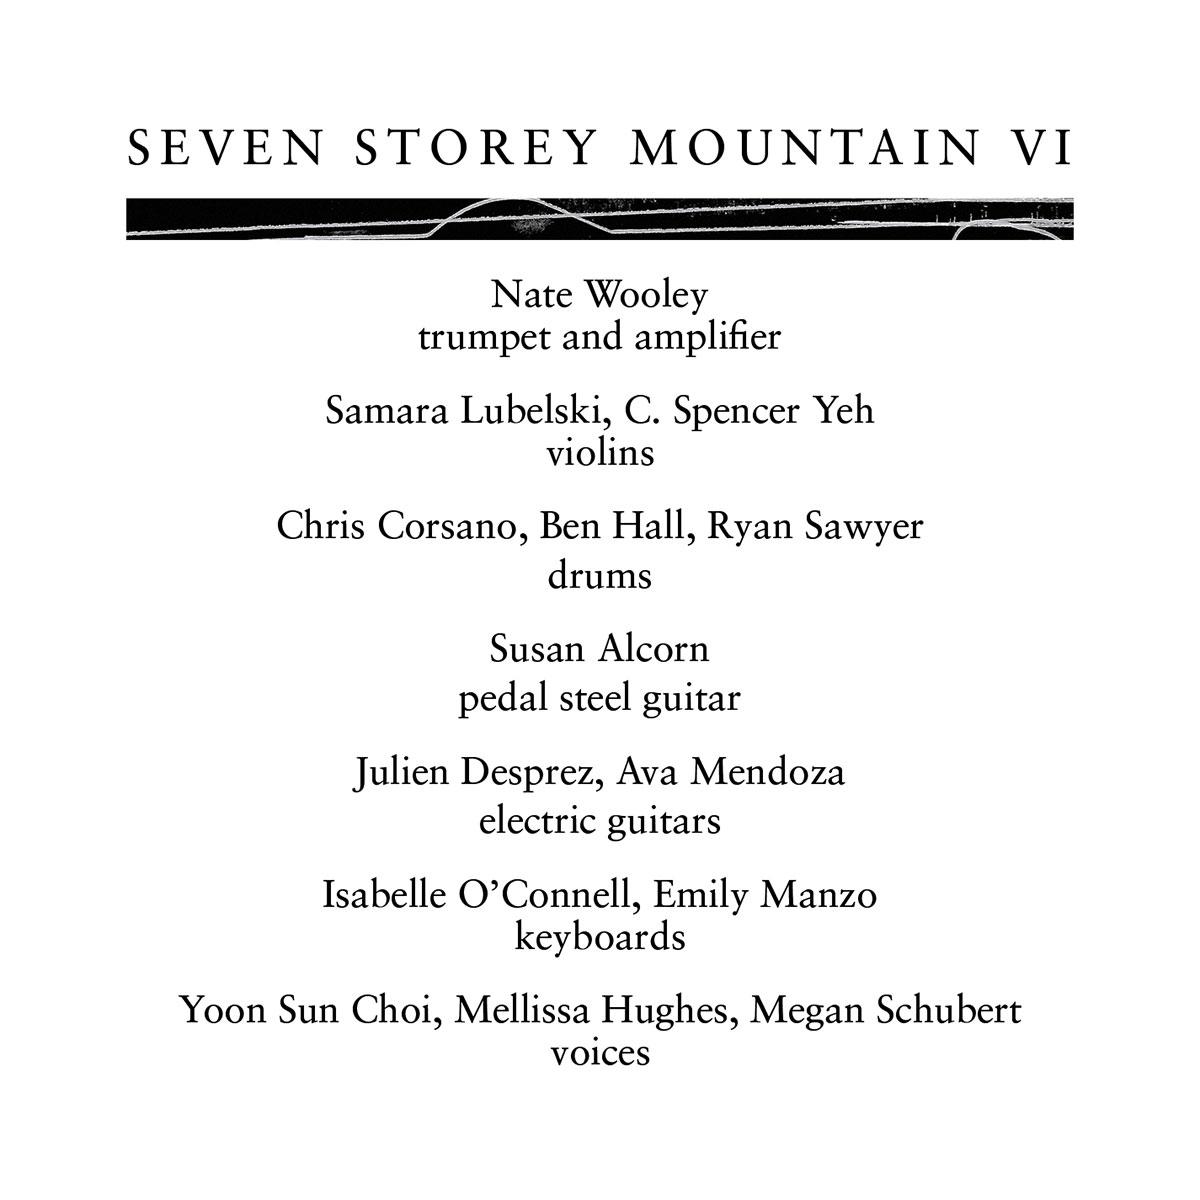 SEVEN STOREY MOUNTAIN VI